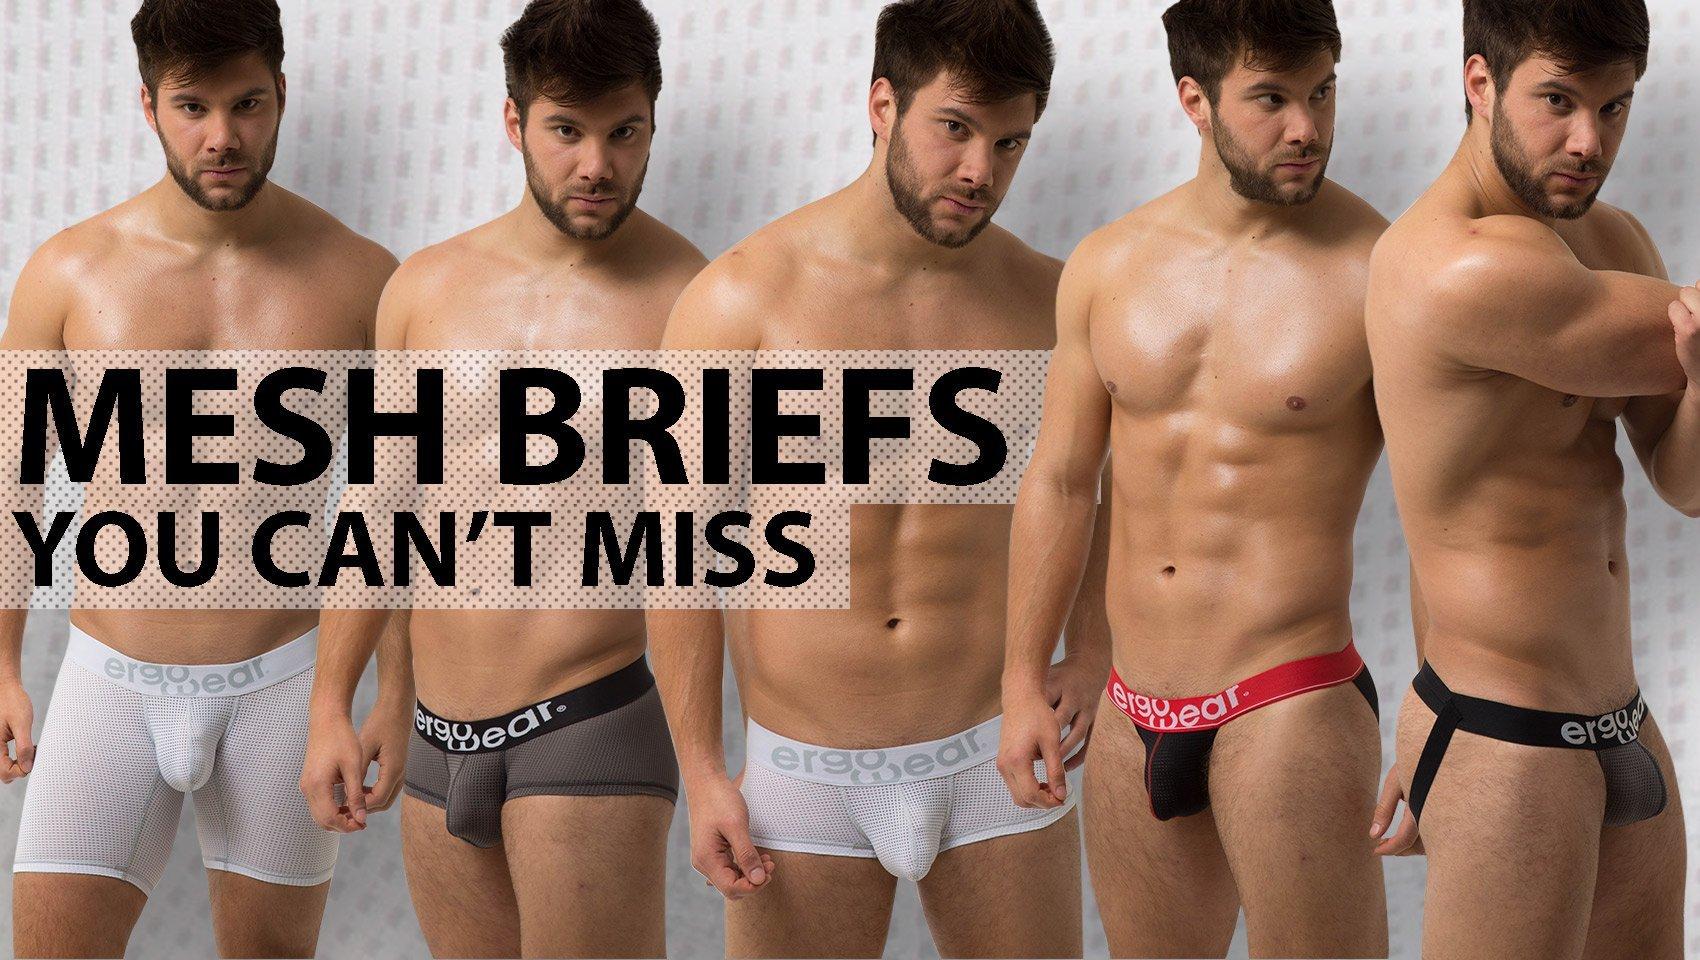 Men's Mesh Briefs - Ergowear